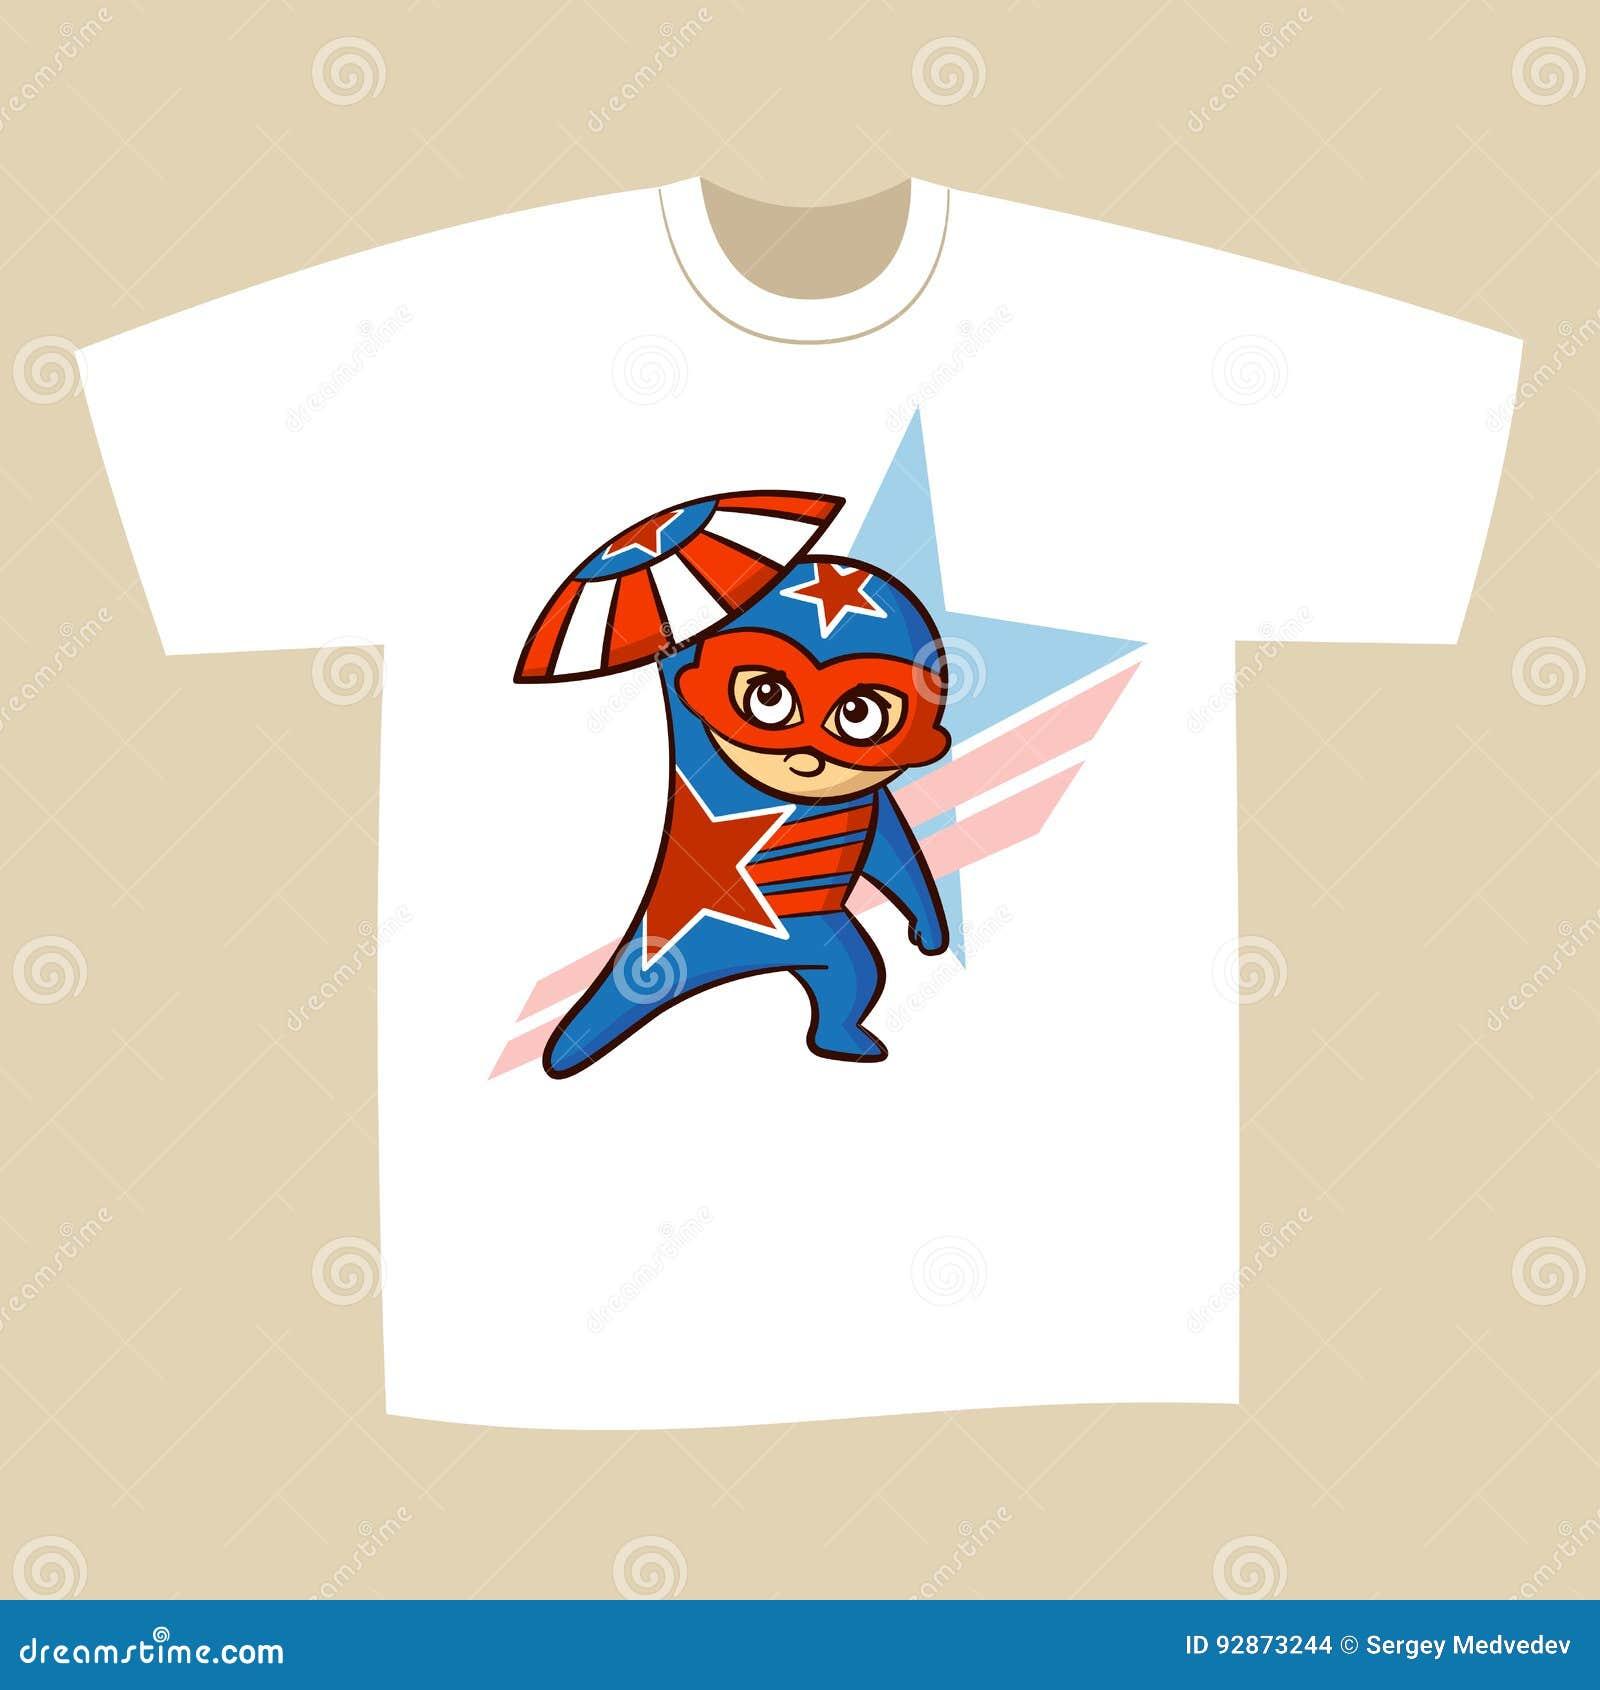 61c602a3 T-shirt Print Design Superhero Stock Illustration - Illustration of ...